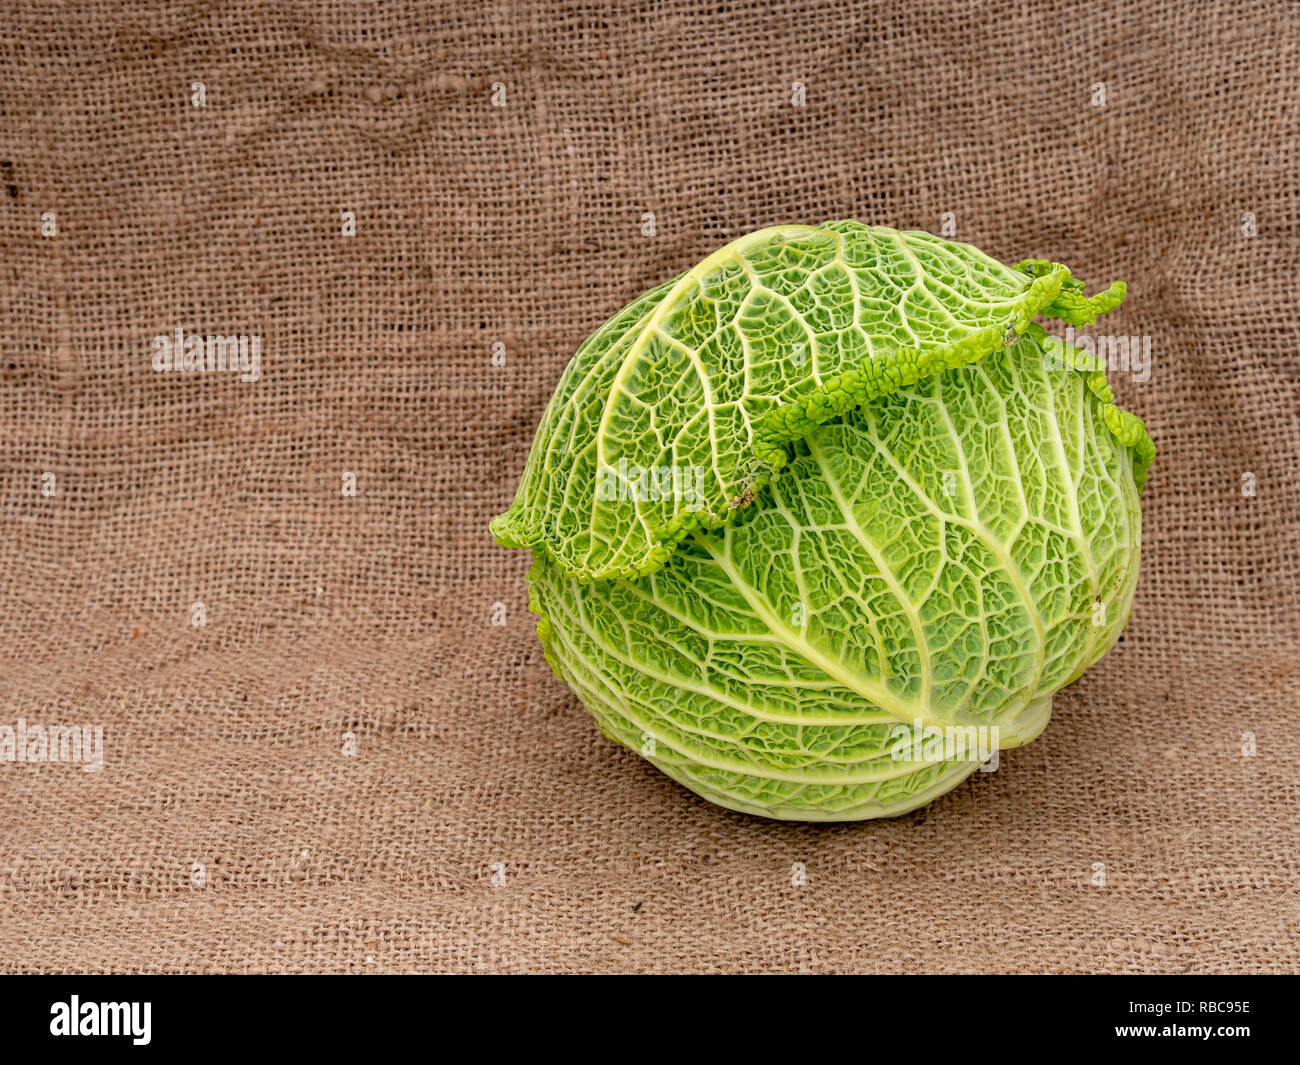 Savoy type cabbage on hessian aka burlap, sacking Green vegetable. - Stock Image